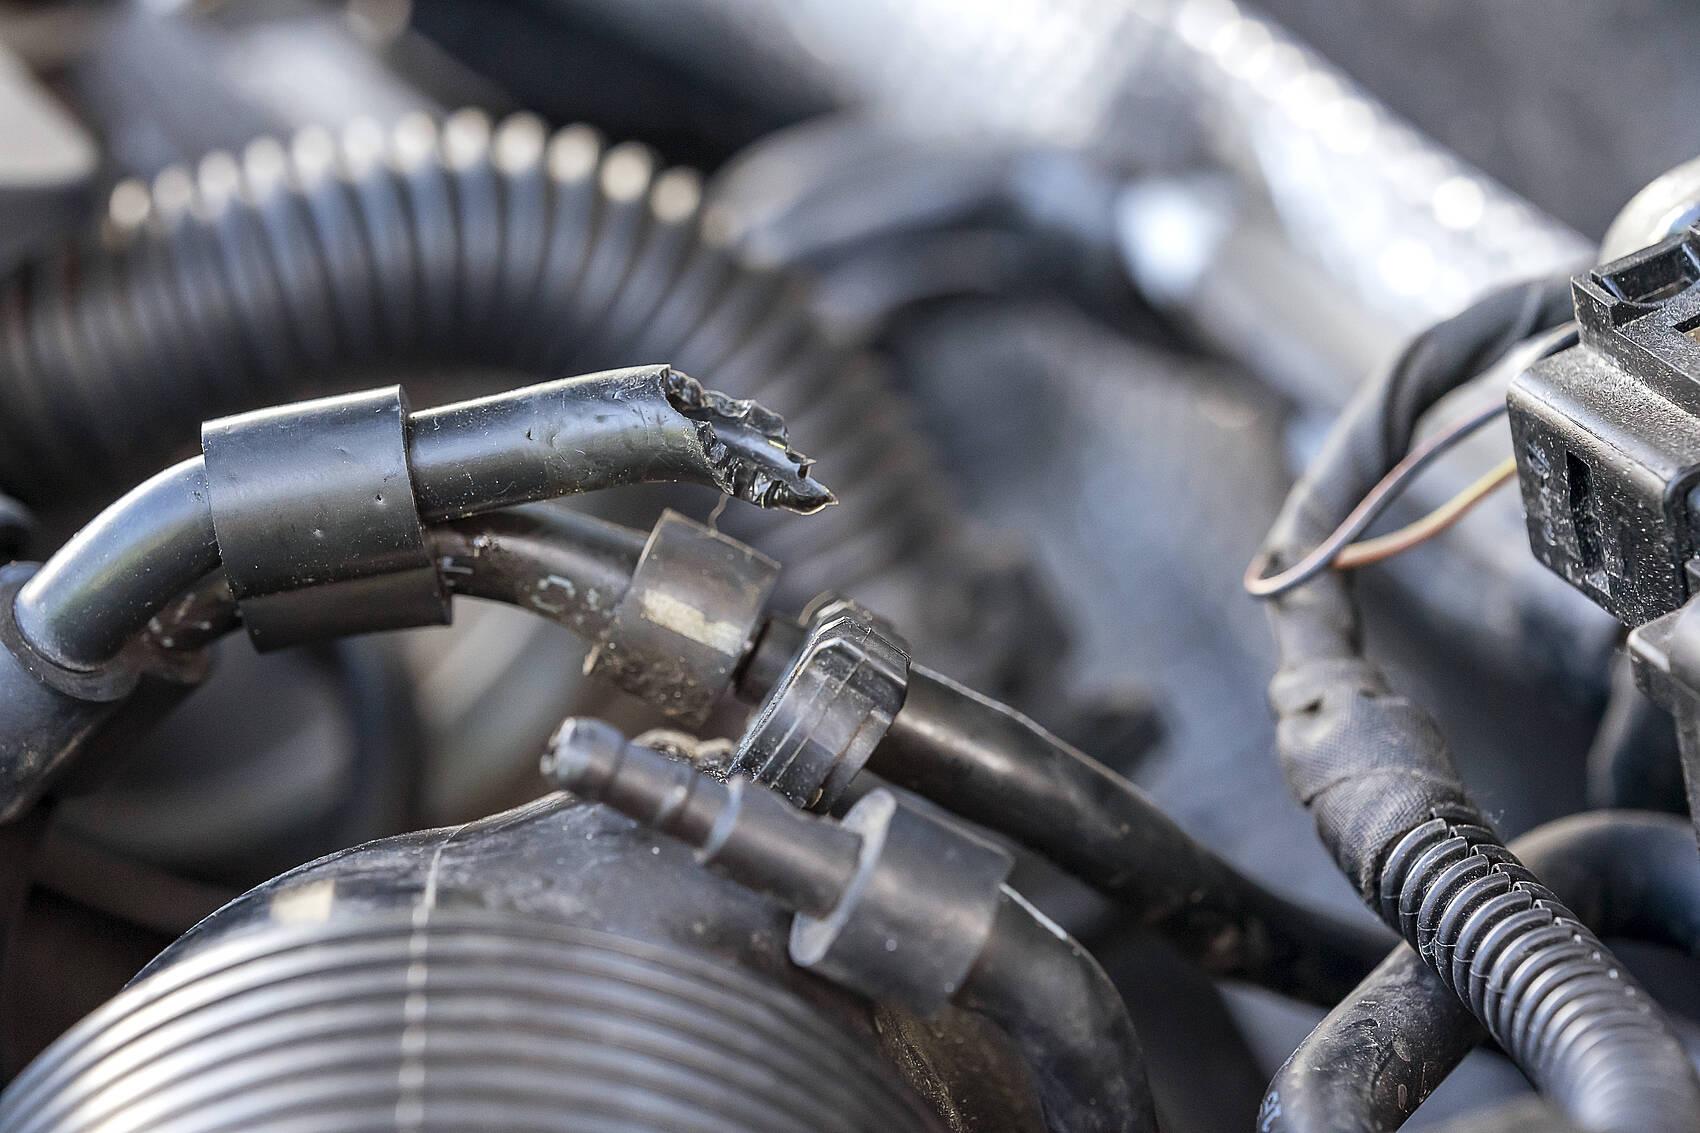 Angebissene Kabel im Motorraum